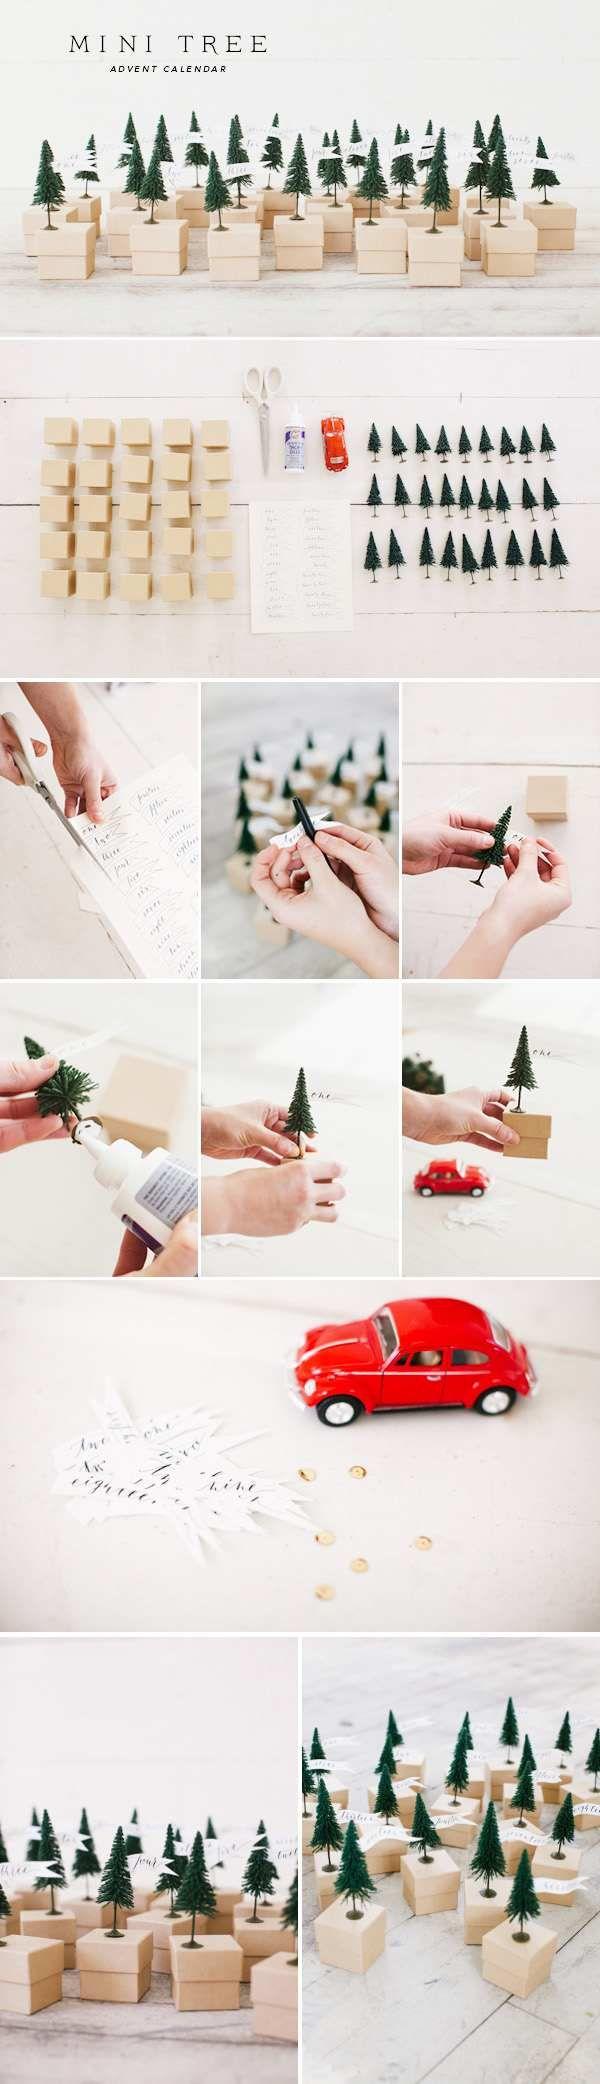 433 besten diy adventskalender bilder auf pinterest. Black Bedroom Furniture Sets. Home Design Ideas